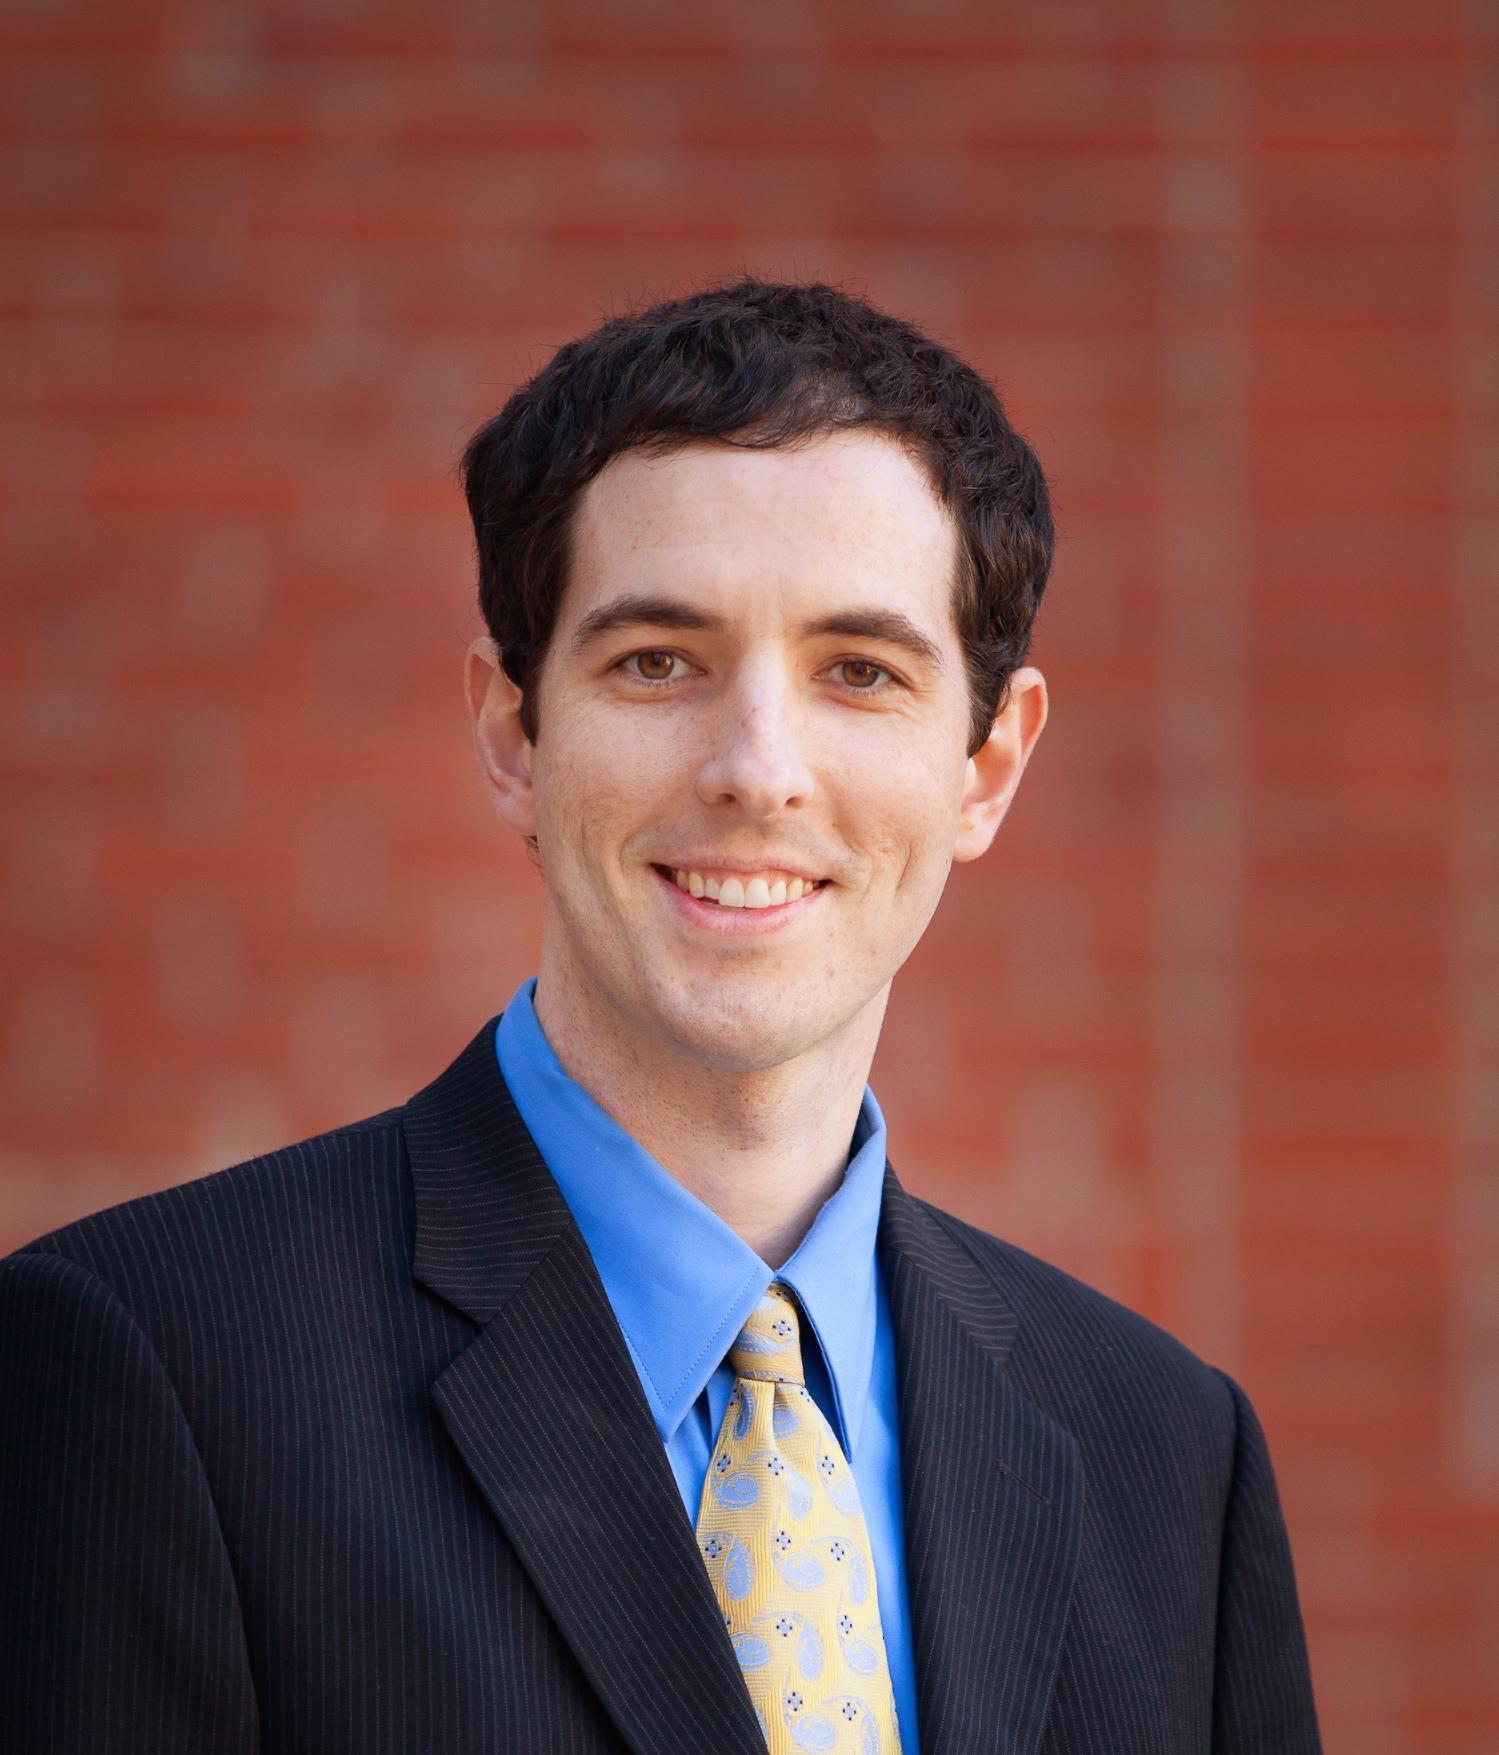 Kevin Huston Elder Law Attorney